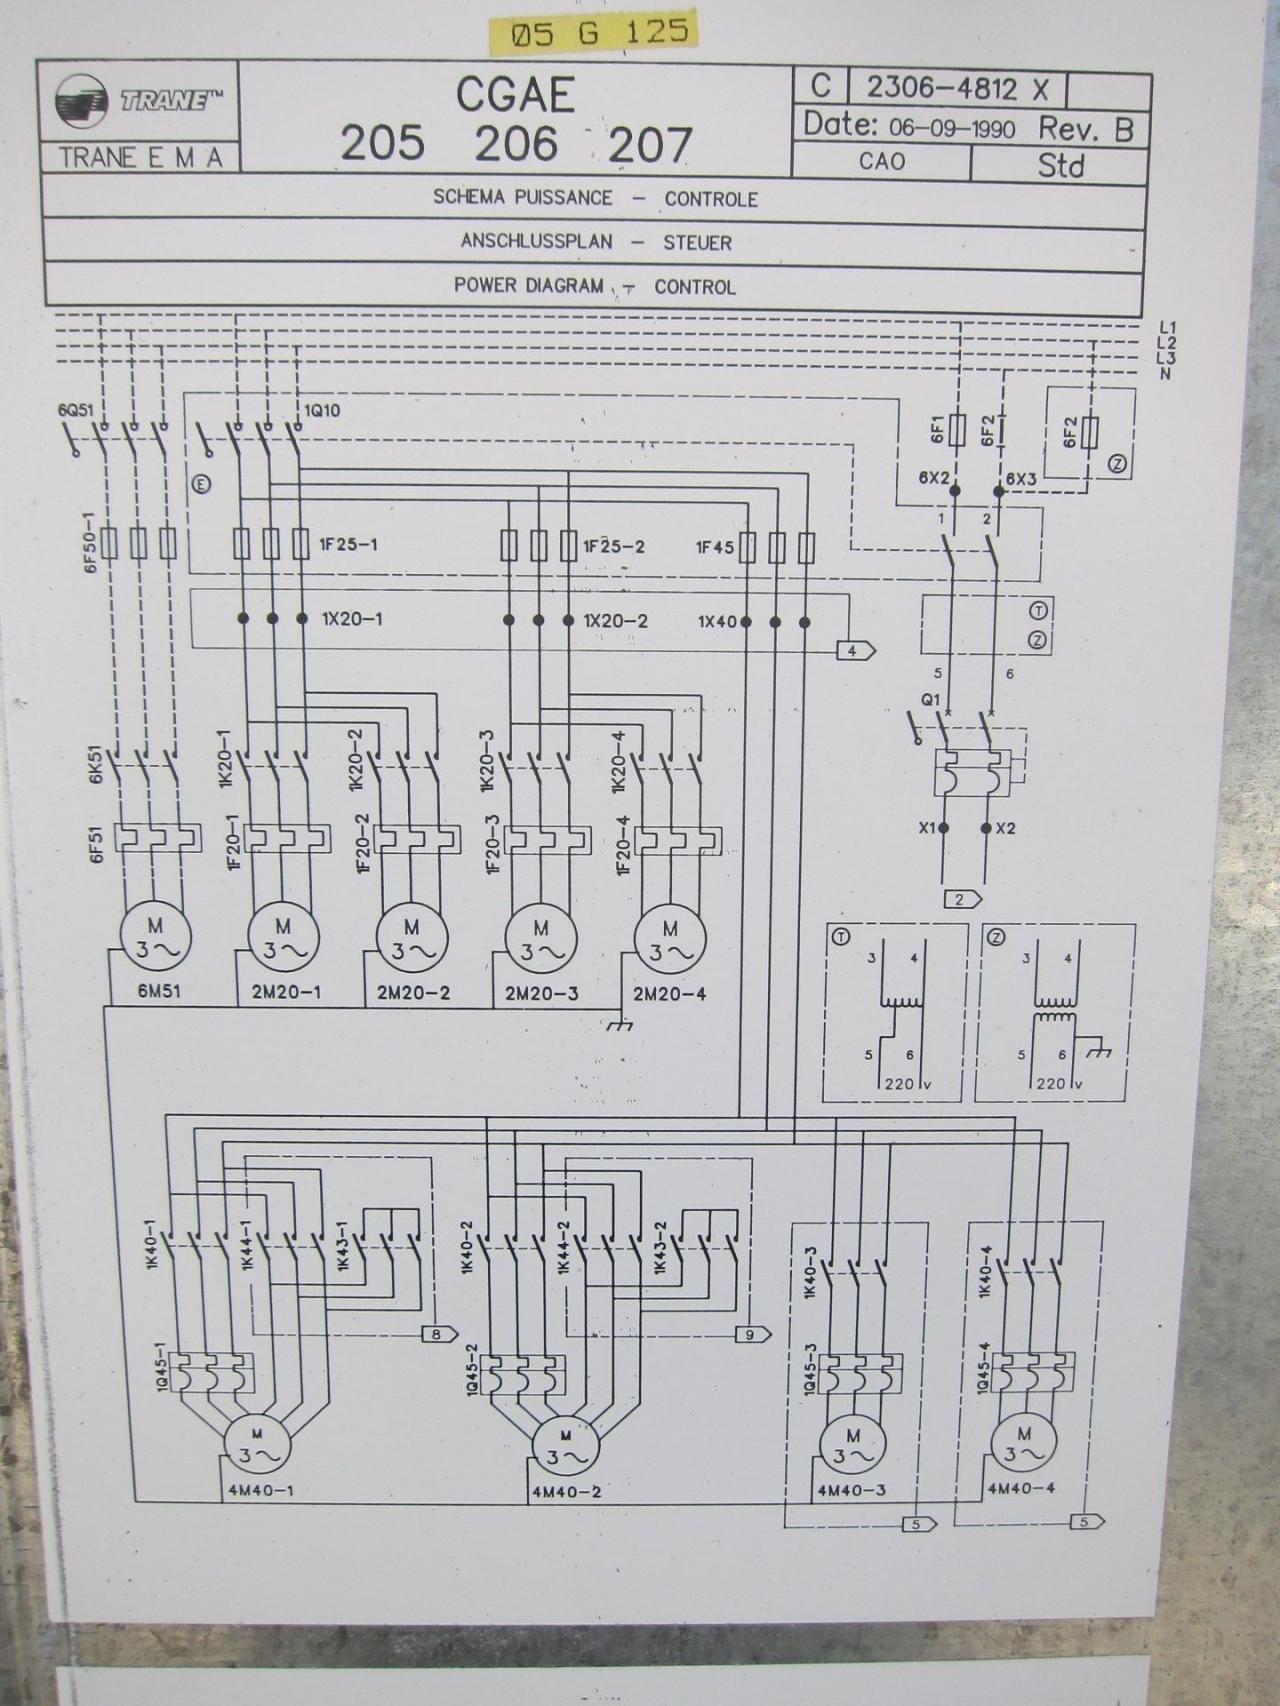 Großzügig Kondensatorschaltplan Fotos - Schaltplan Serie Circuit ...